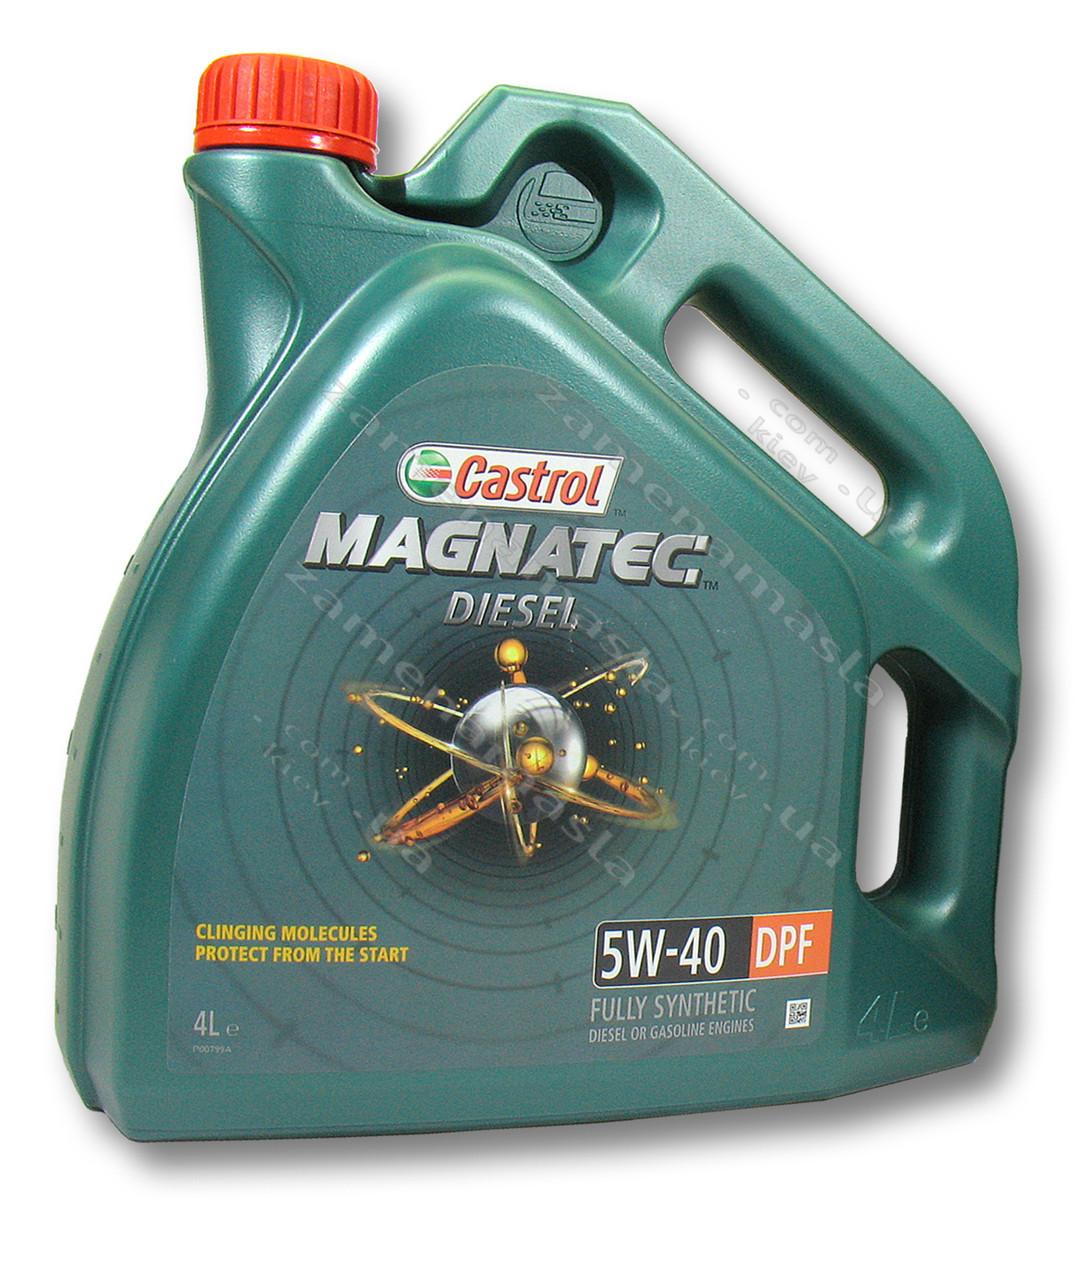 Castrol Magnatec Diesel 5W-40 DPF 4л - моторное масло